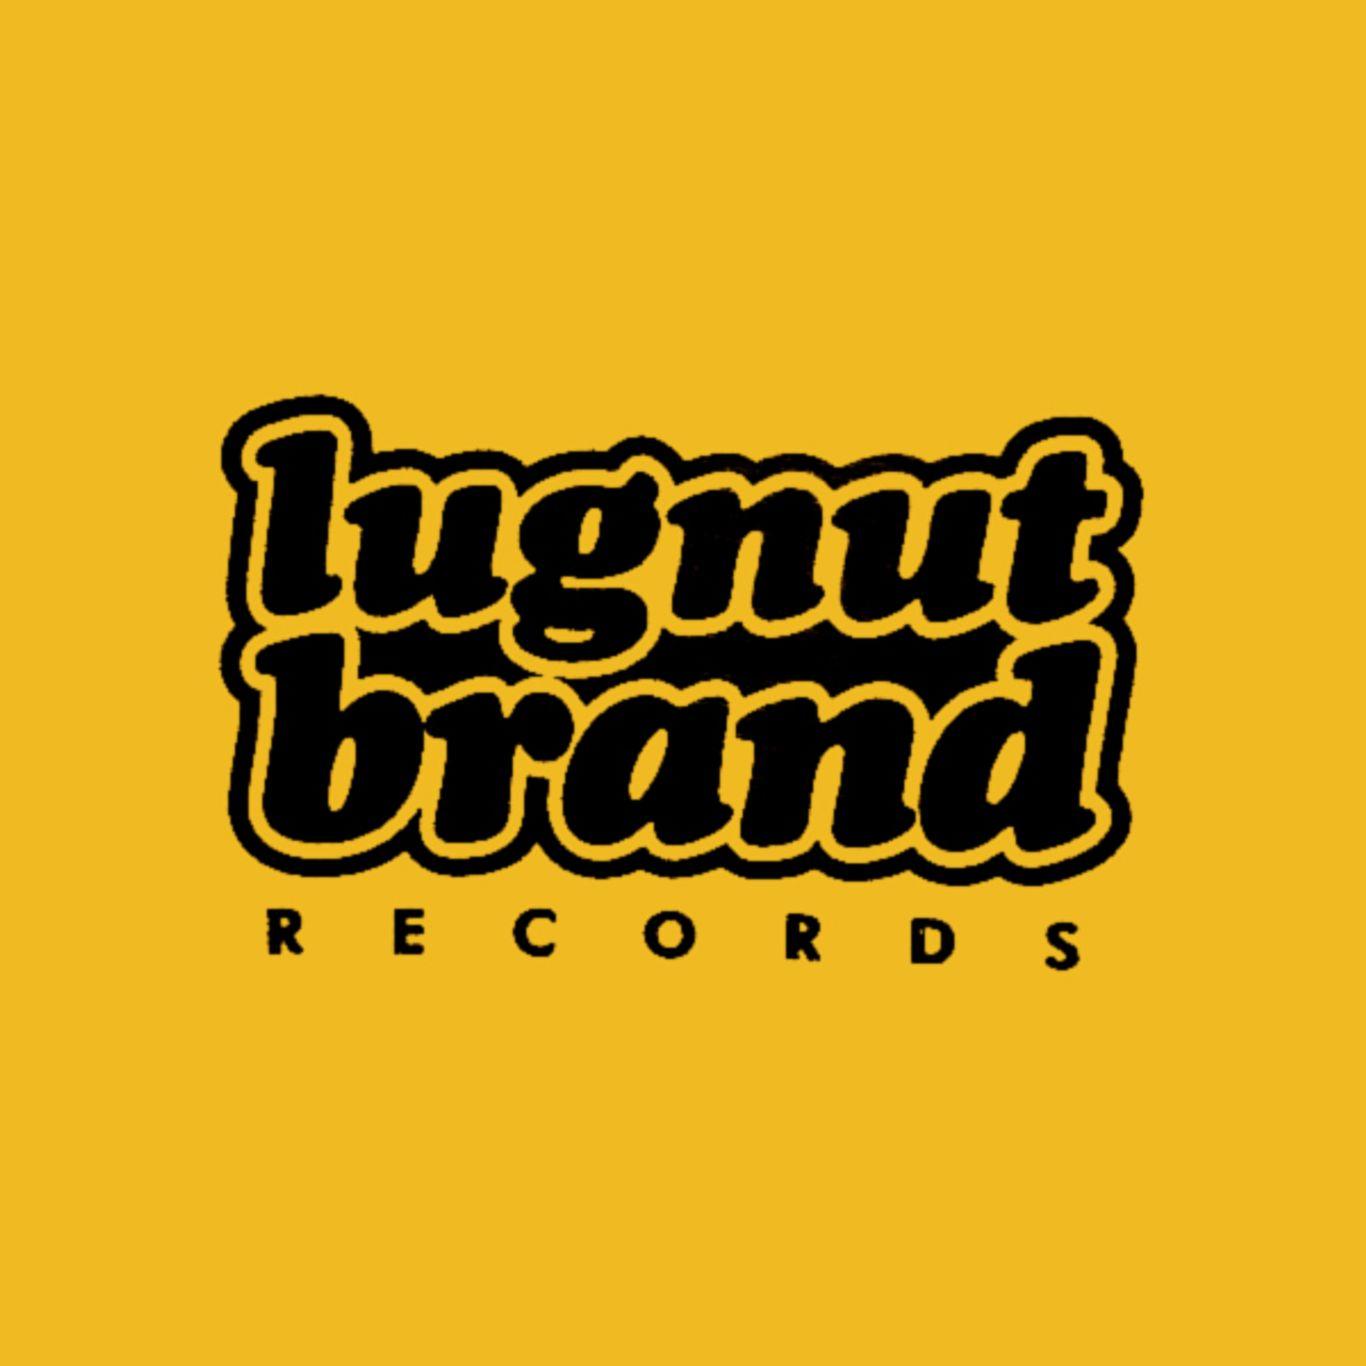 Lugnut Brand Records